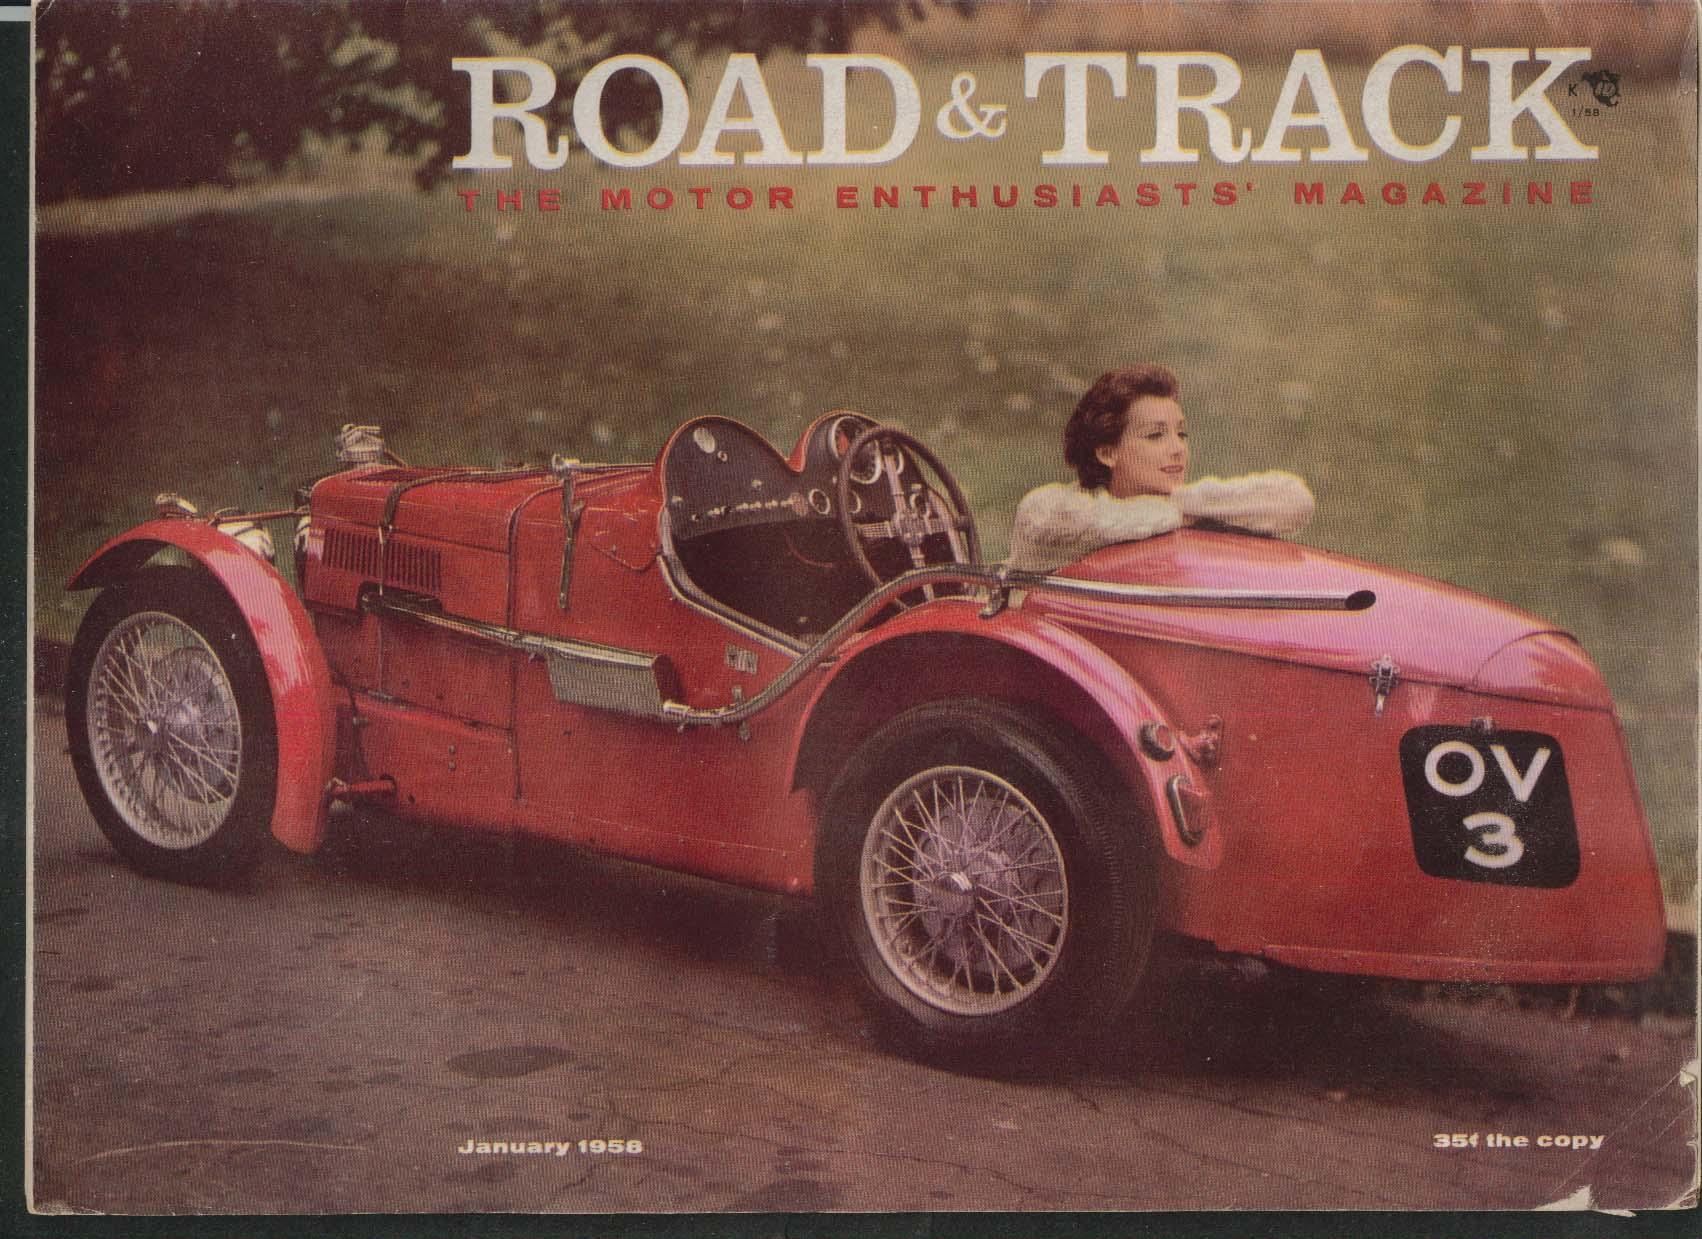 ROAD & TRACK Rolls-Royce Phanton III Mercedes 300-SL Vauxhall road tests 1 1958